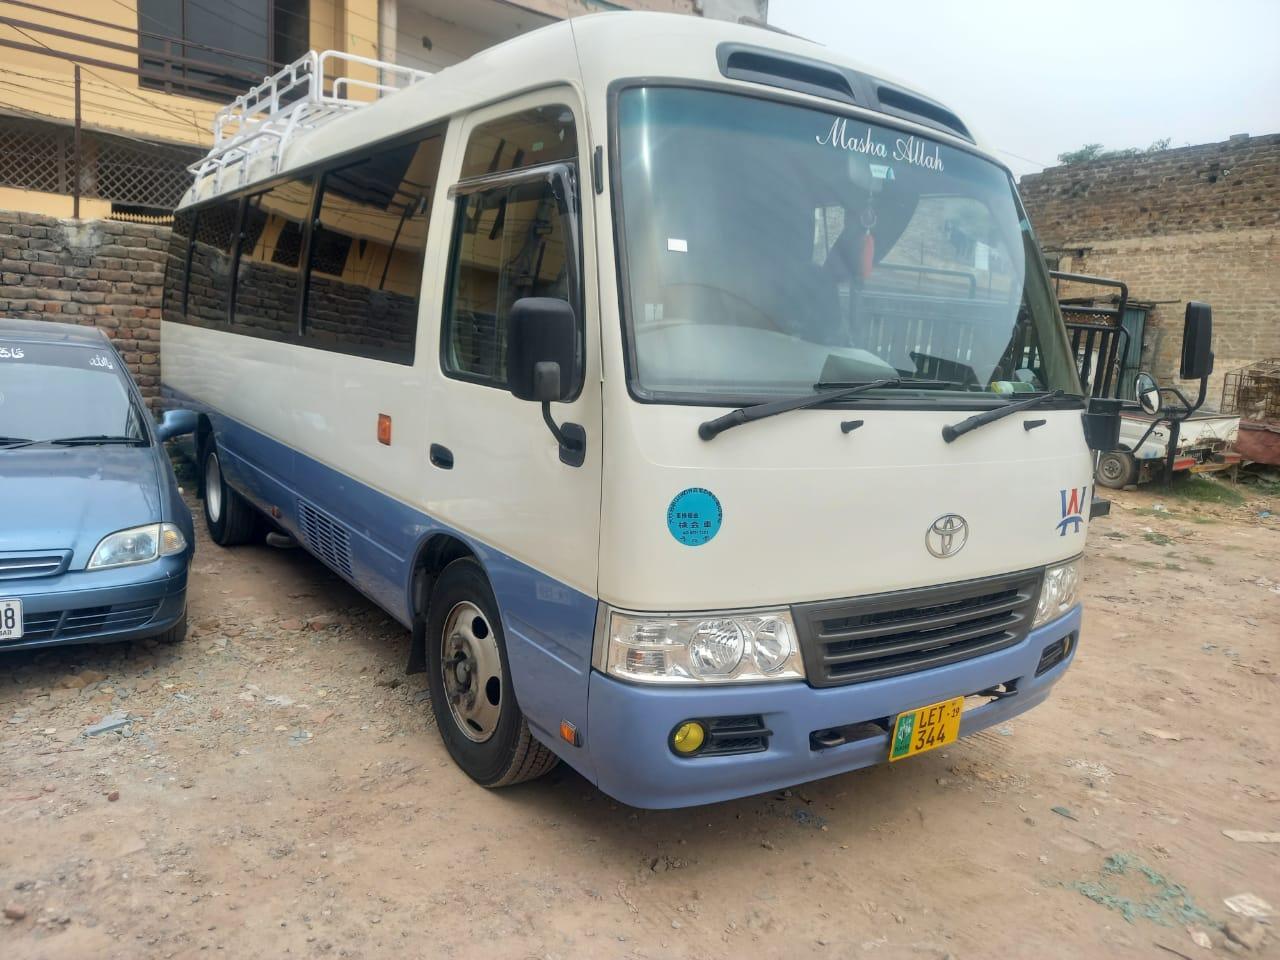 Toyota Coaster bus ready for Hunza tour - Rozefs Tourism